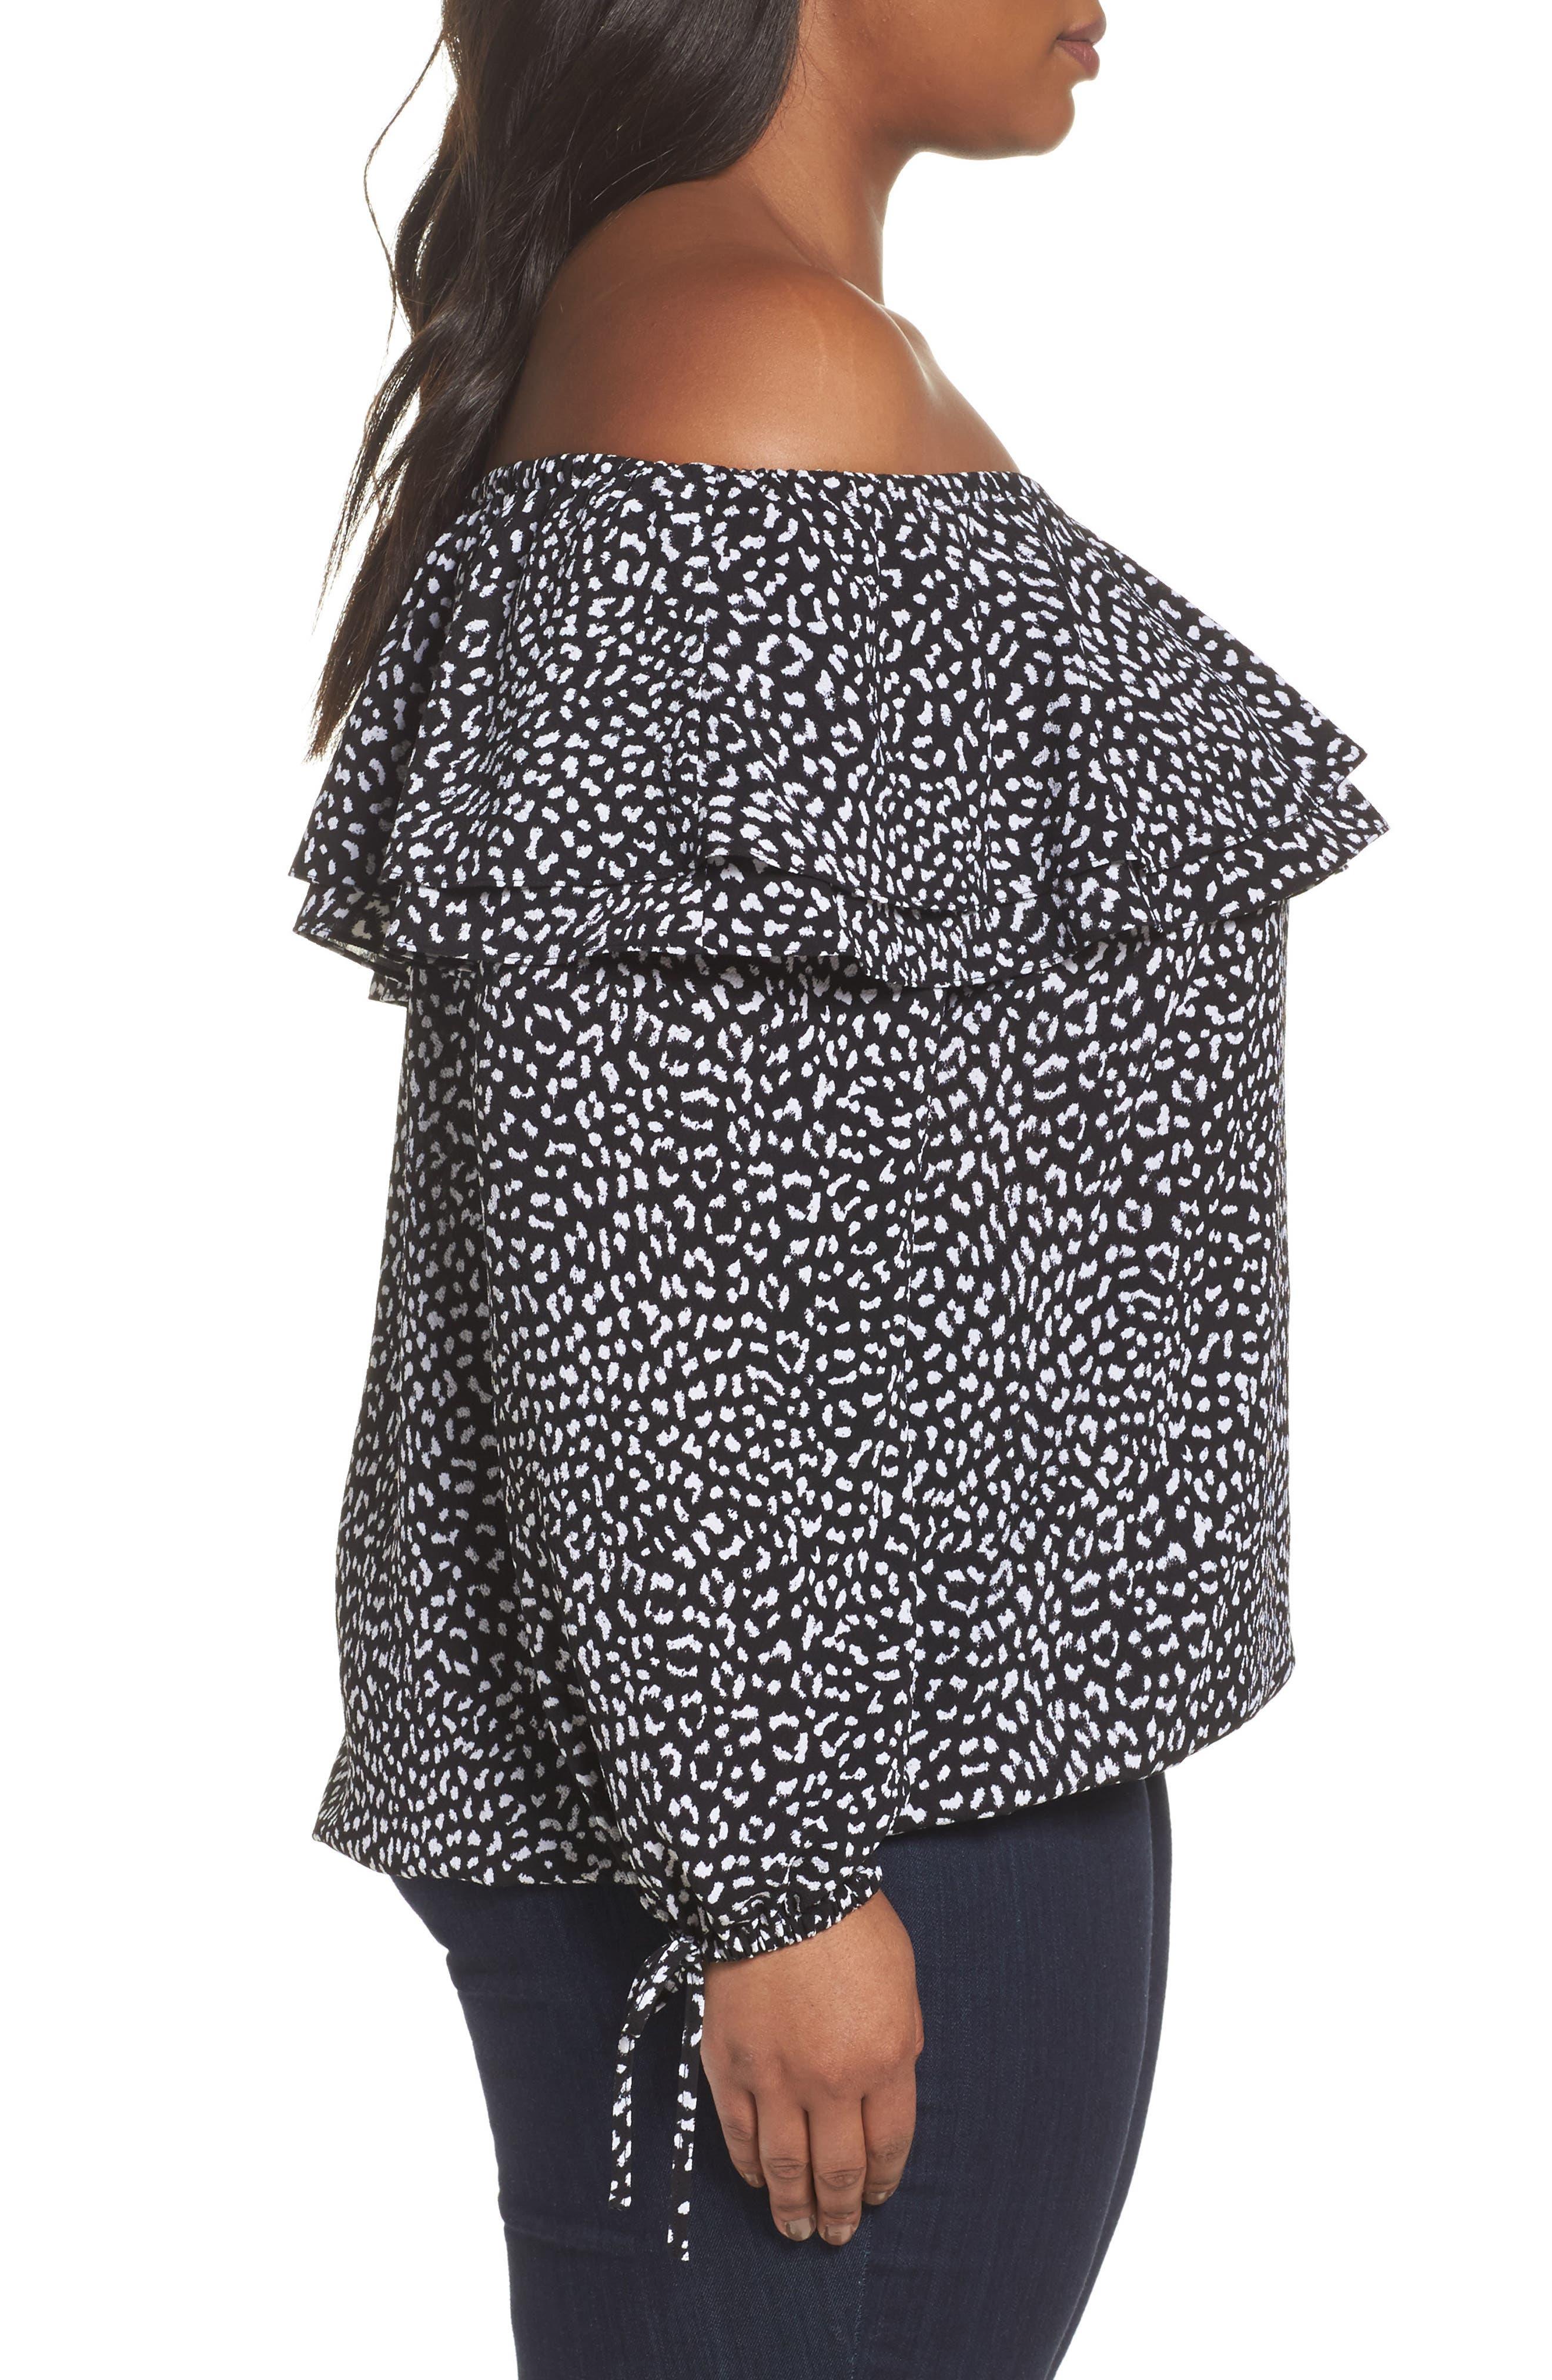 Alternate Image 3  - MICHAEL Michael Kors Cheetah Print Off the Shoulder Top (Plus Size)